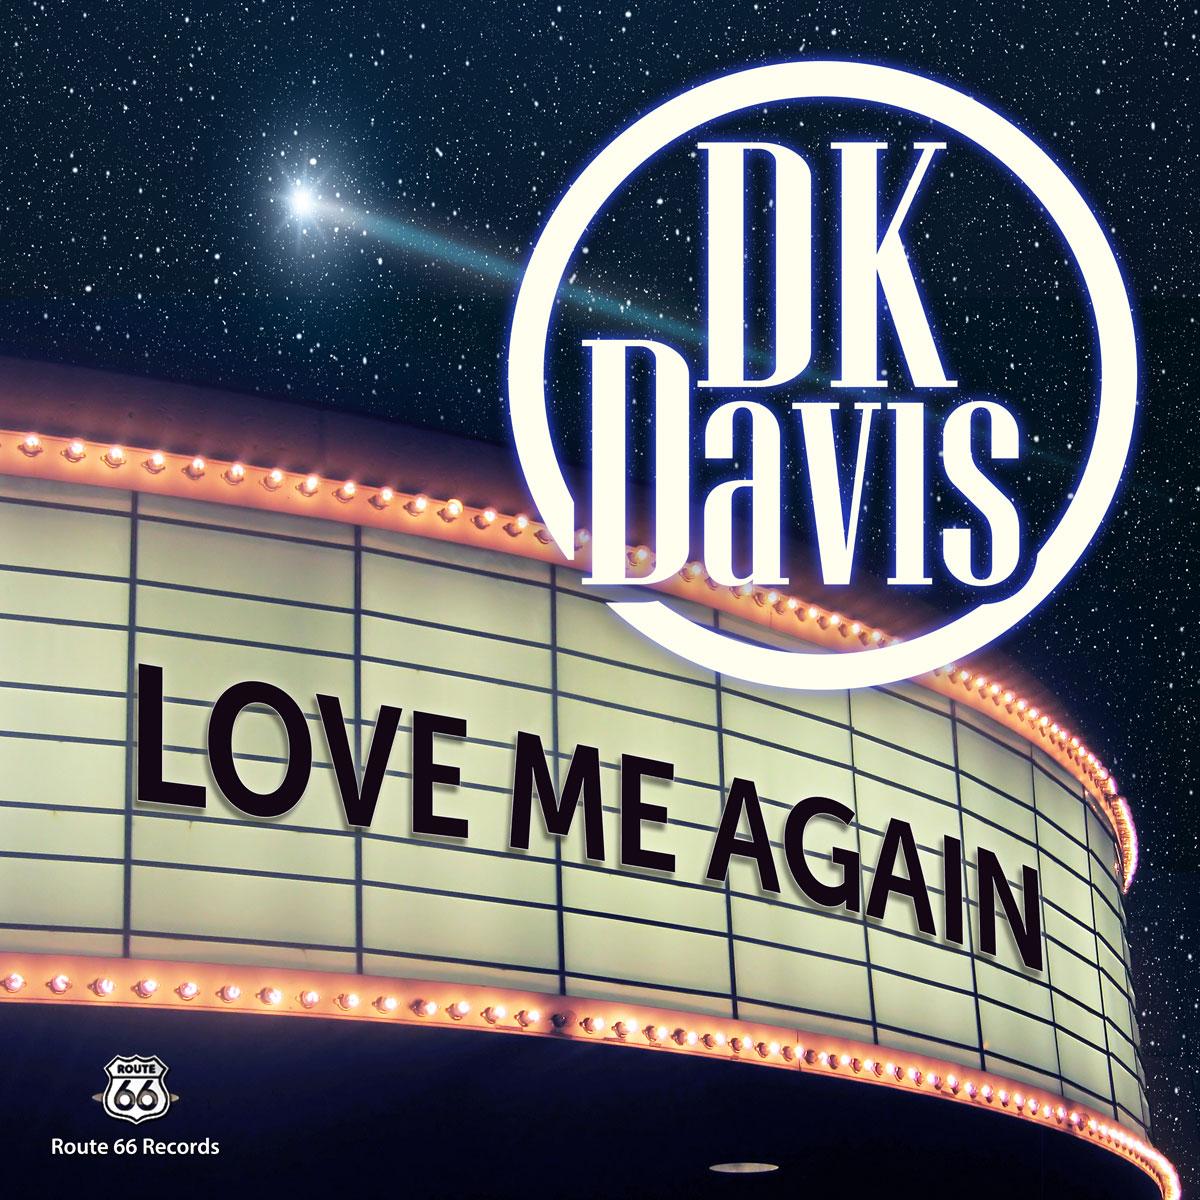 dk davis_love-me-again